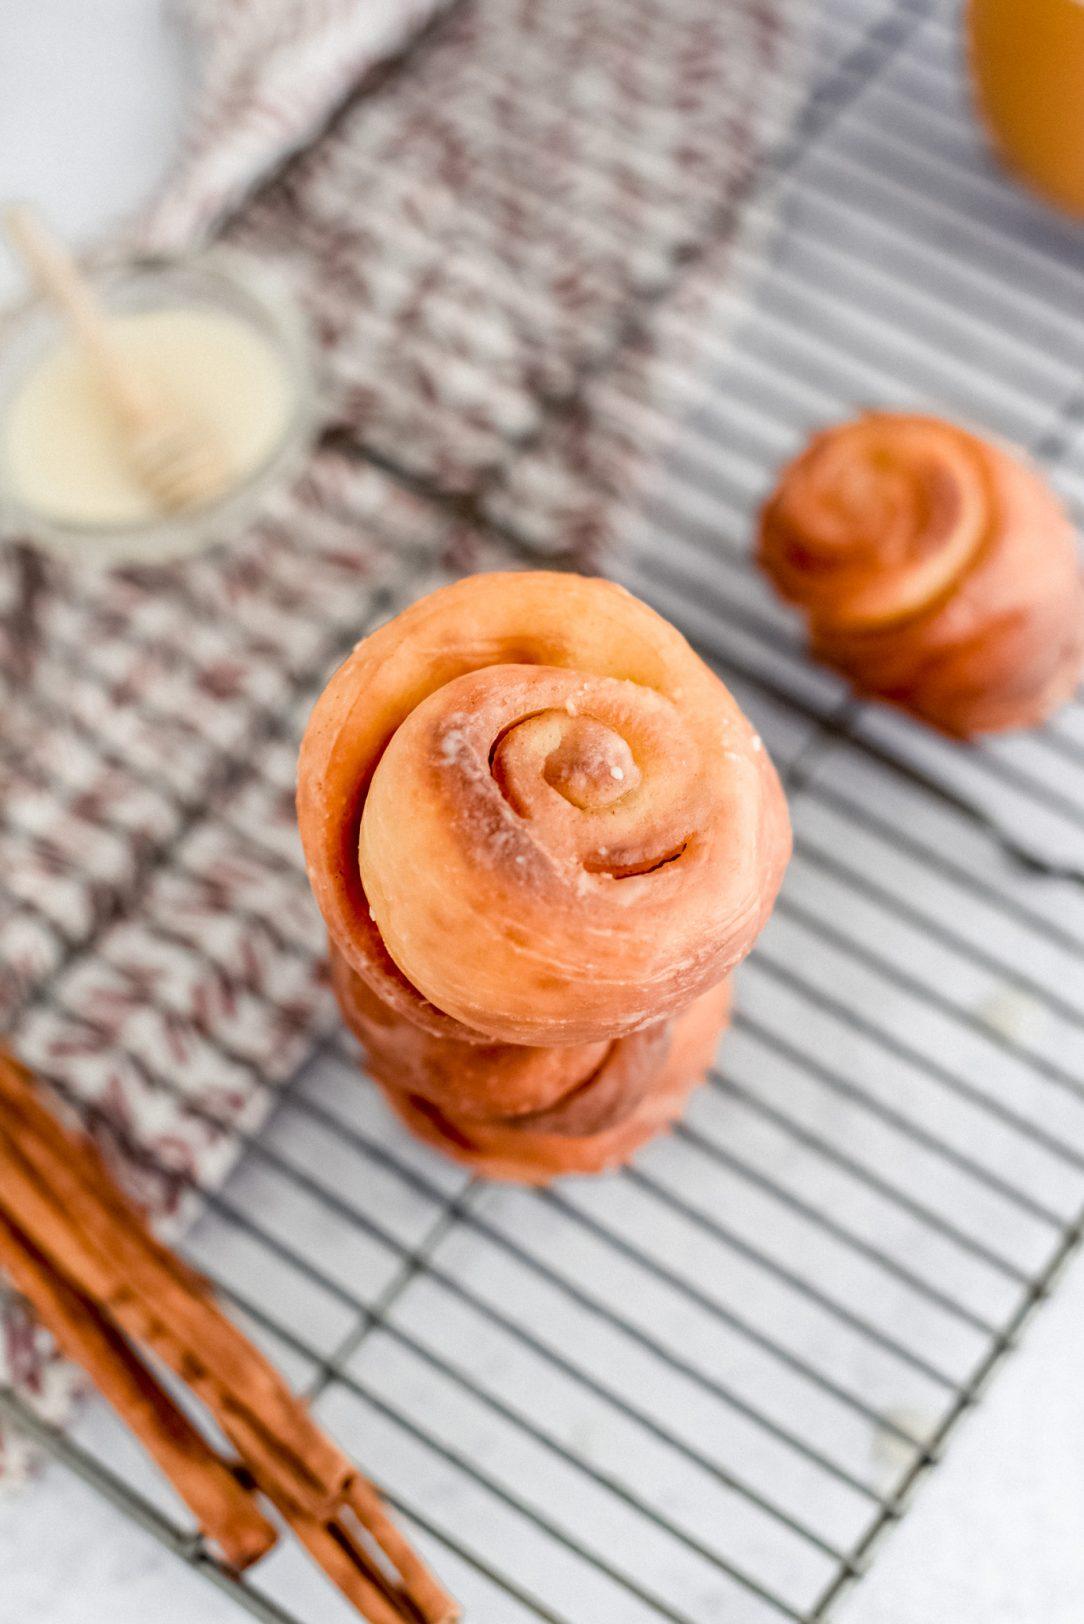 honey bun stacked on baking rack